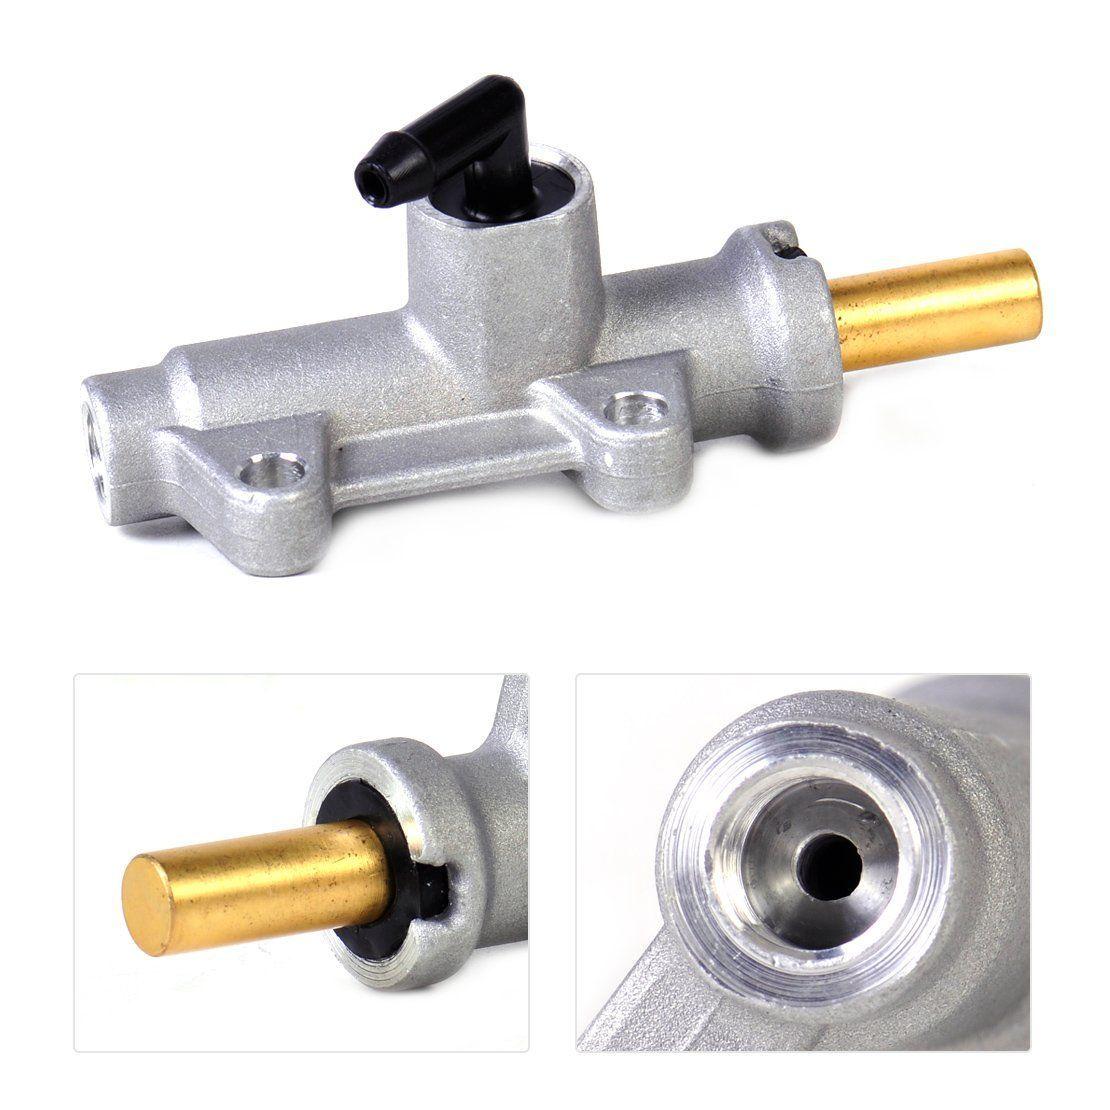 Rear Brake Master Cylinder For Polaris Sportsman 335 400 450 500-800 1911113